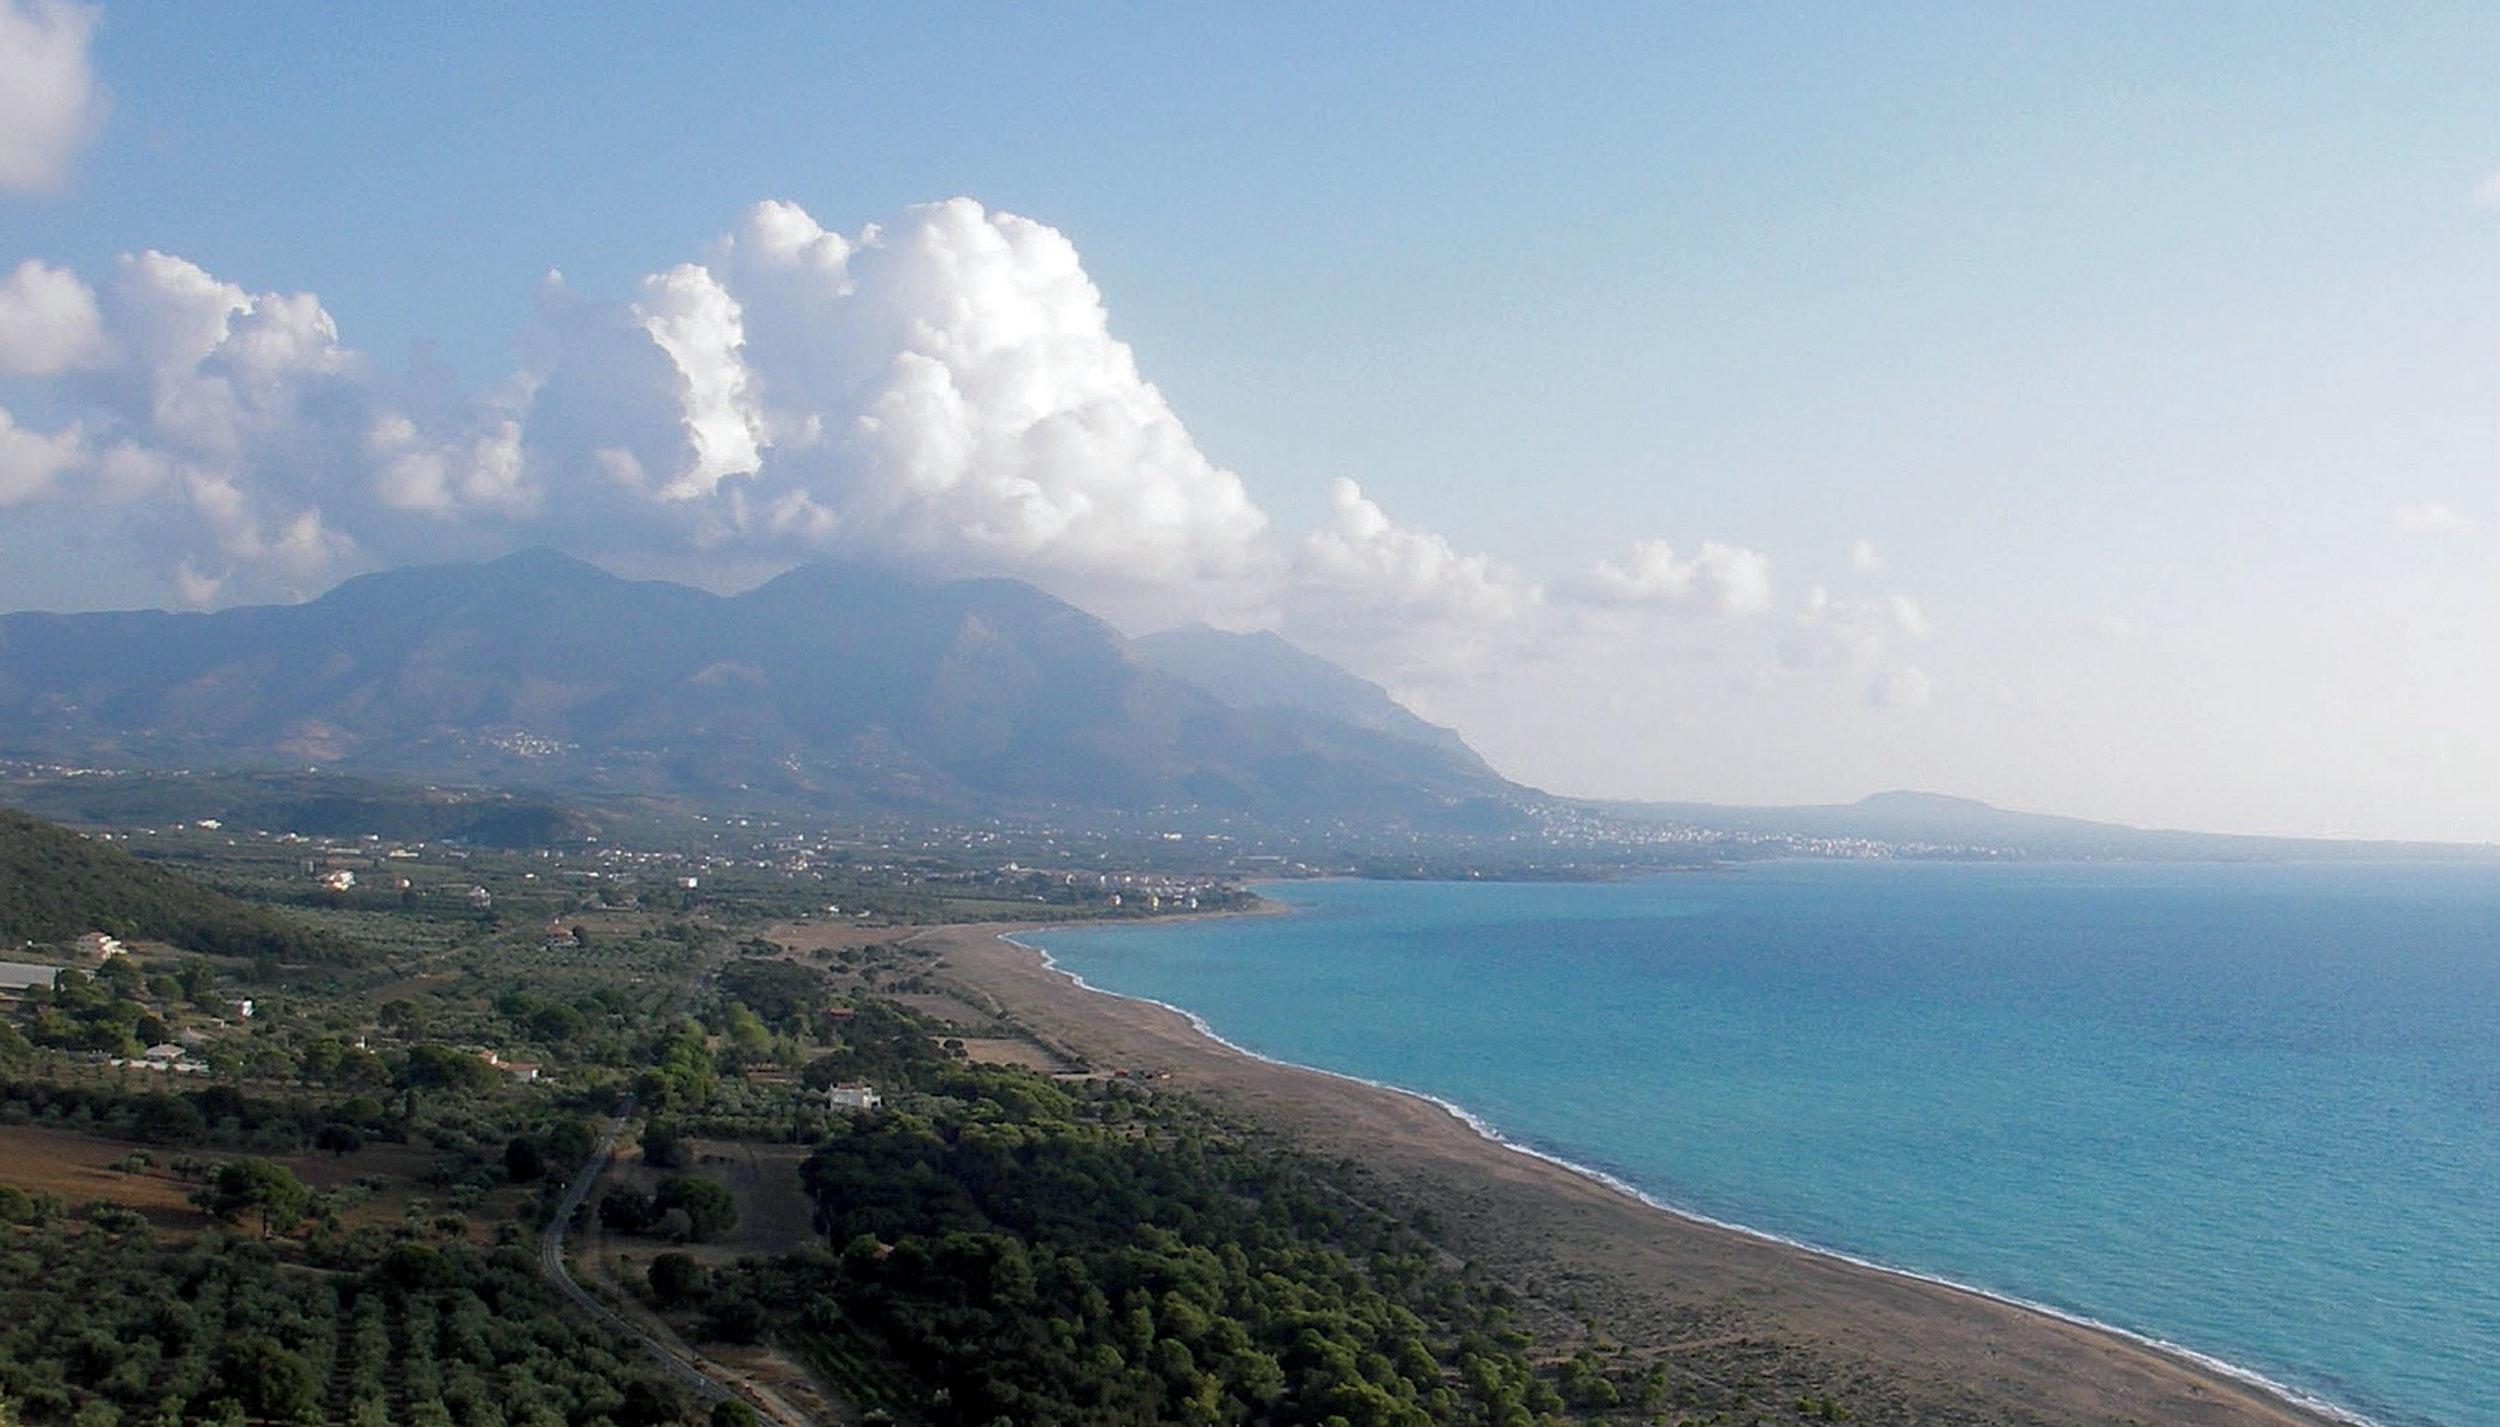 Kyparissia Bay in western Peloponnese. © ARCHELON